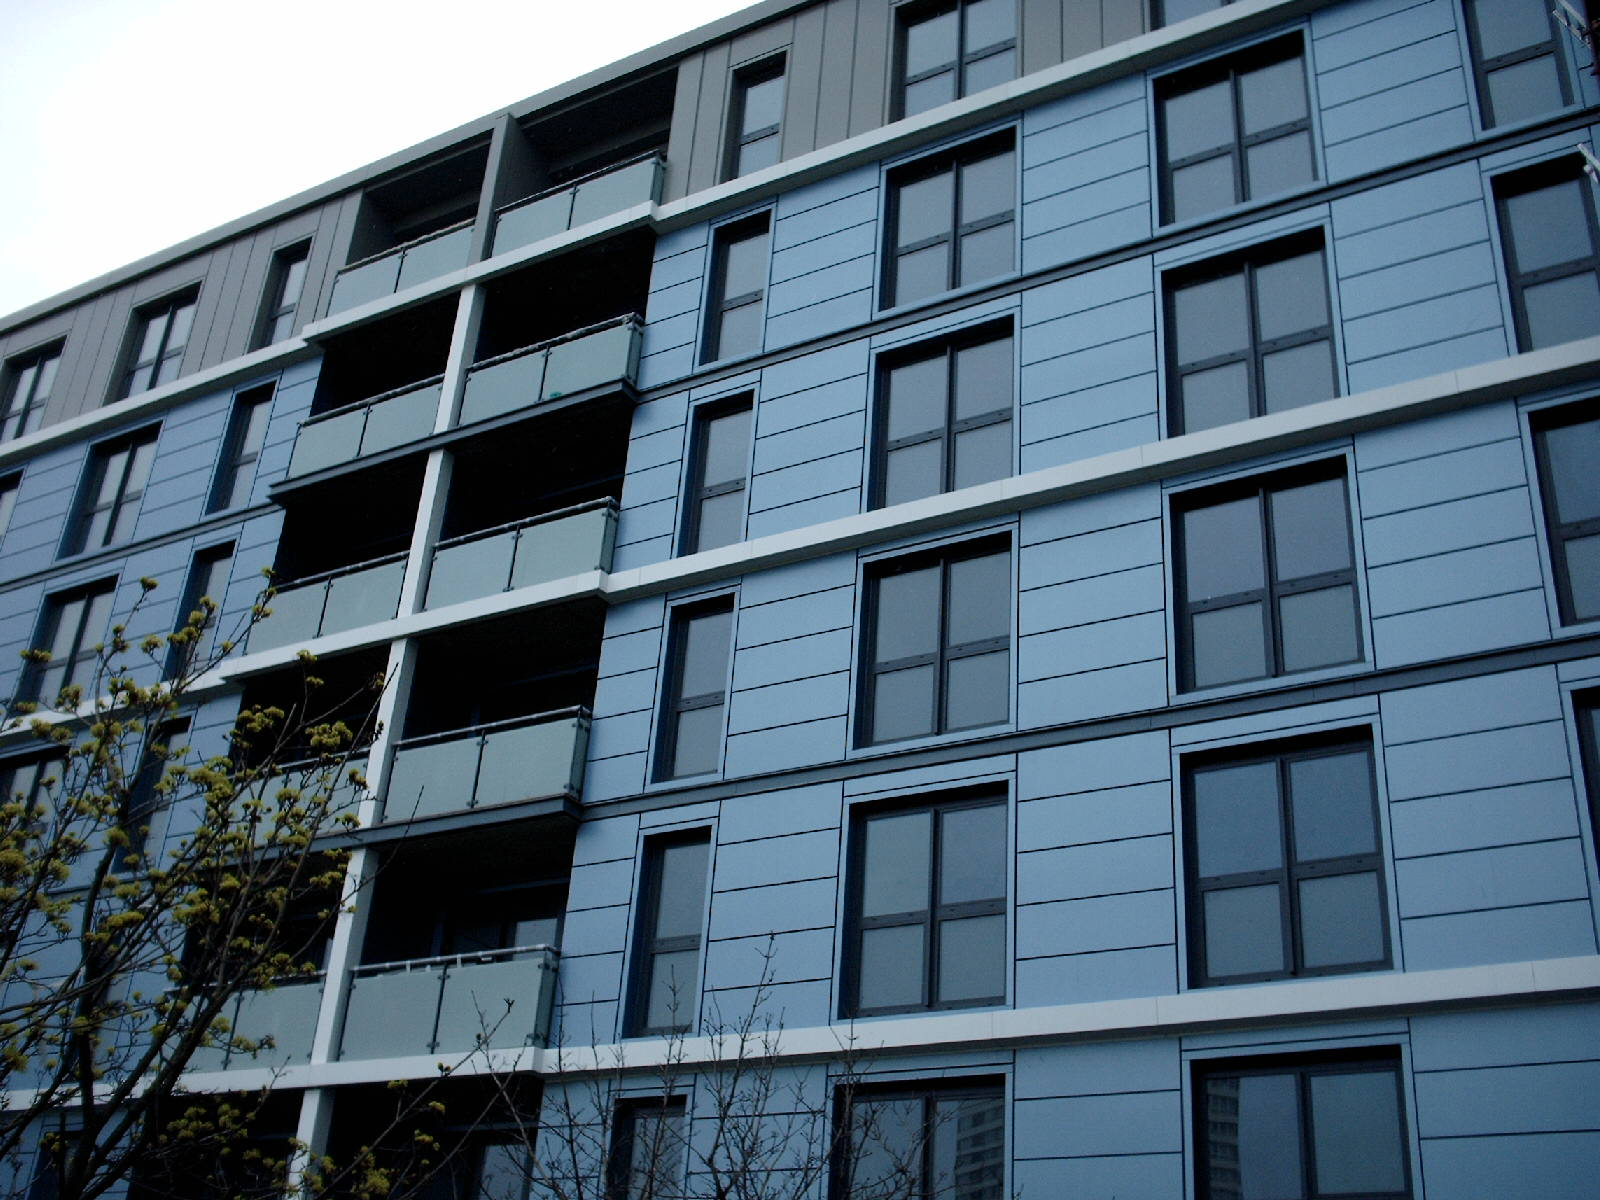 Stratford-High-St-London-UK-Larson-PE-PVdF-2500m_1591087441.jpg